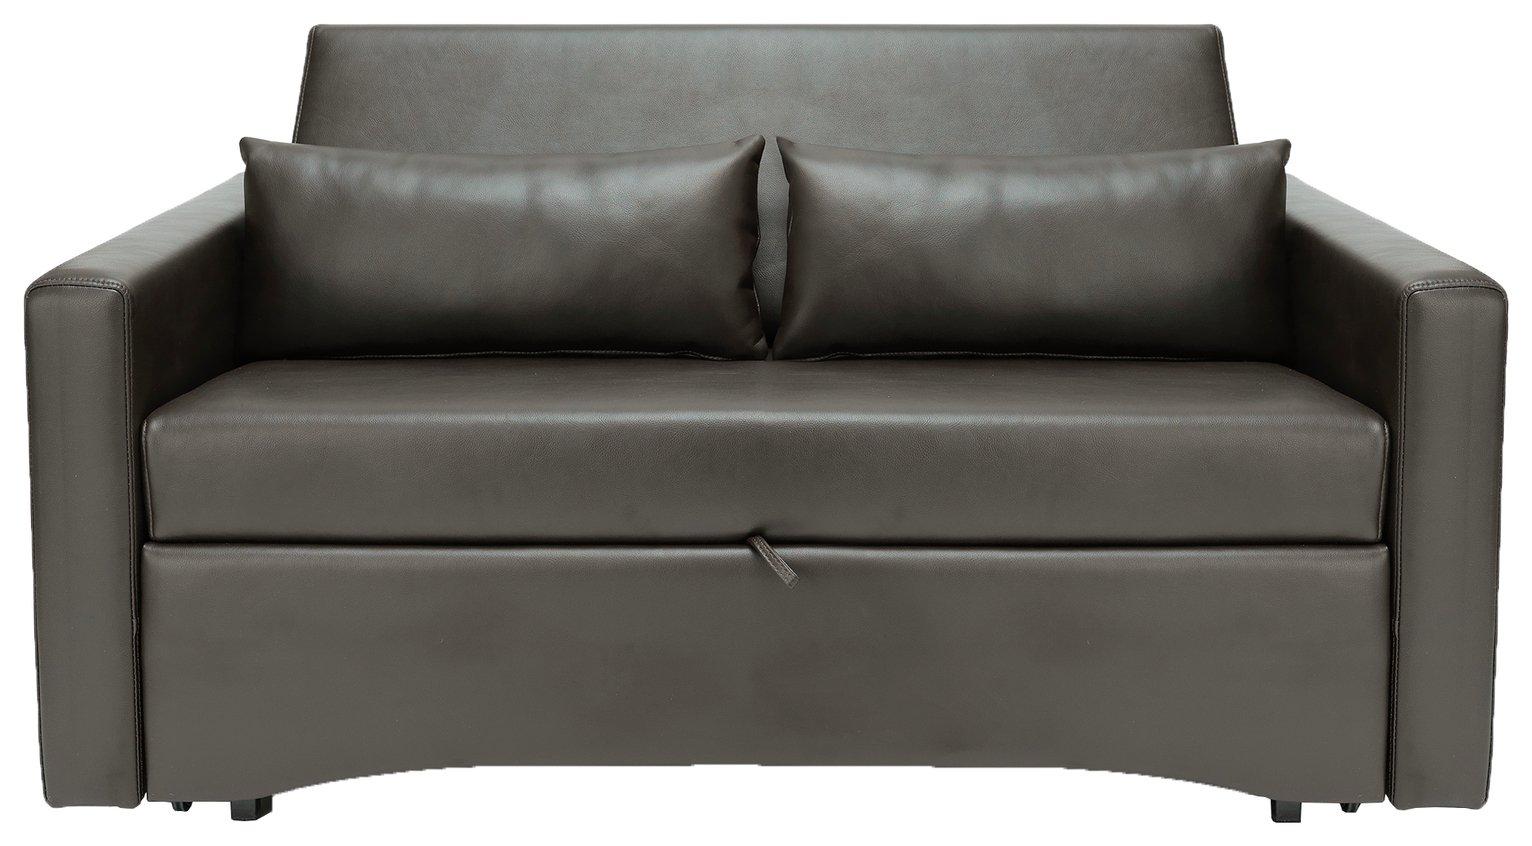 Argos Home Reagan 2 Seater Faux Leather Sofa Bed -Dark Brown